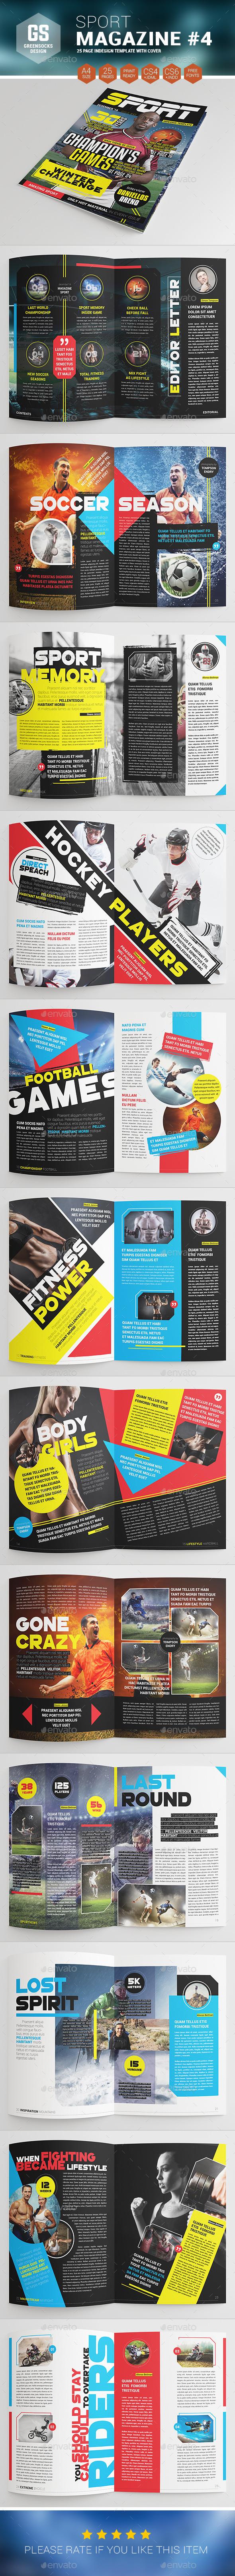 Sport Magazine #4 - Magazines Print Templates